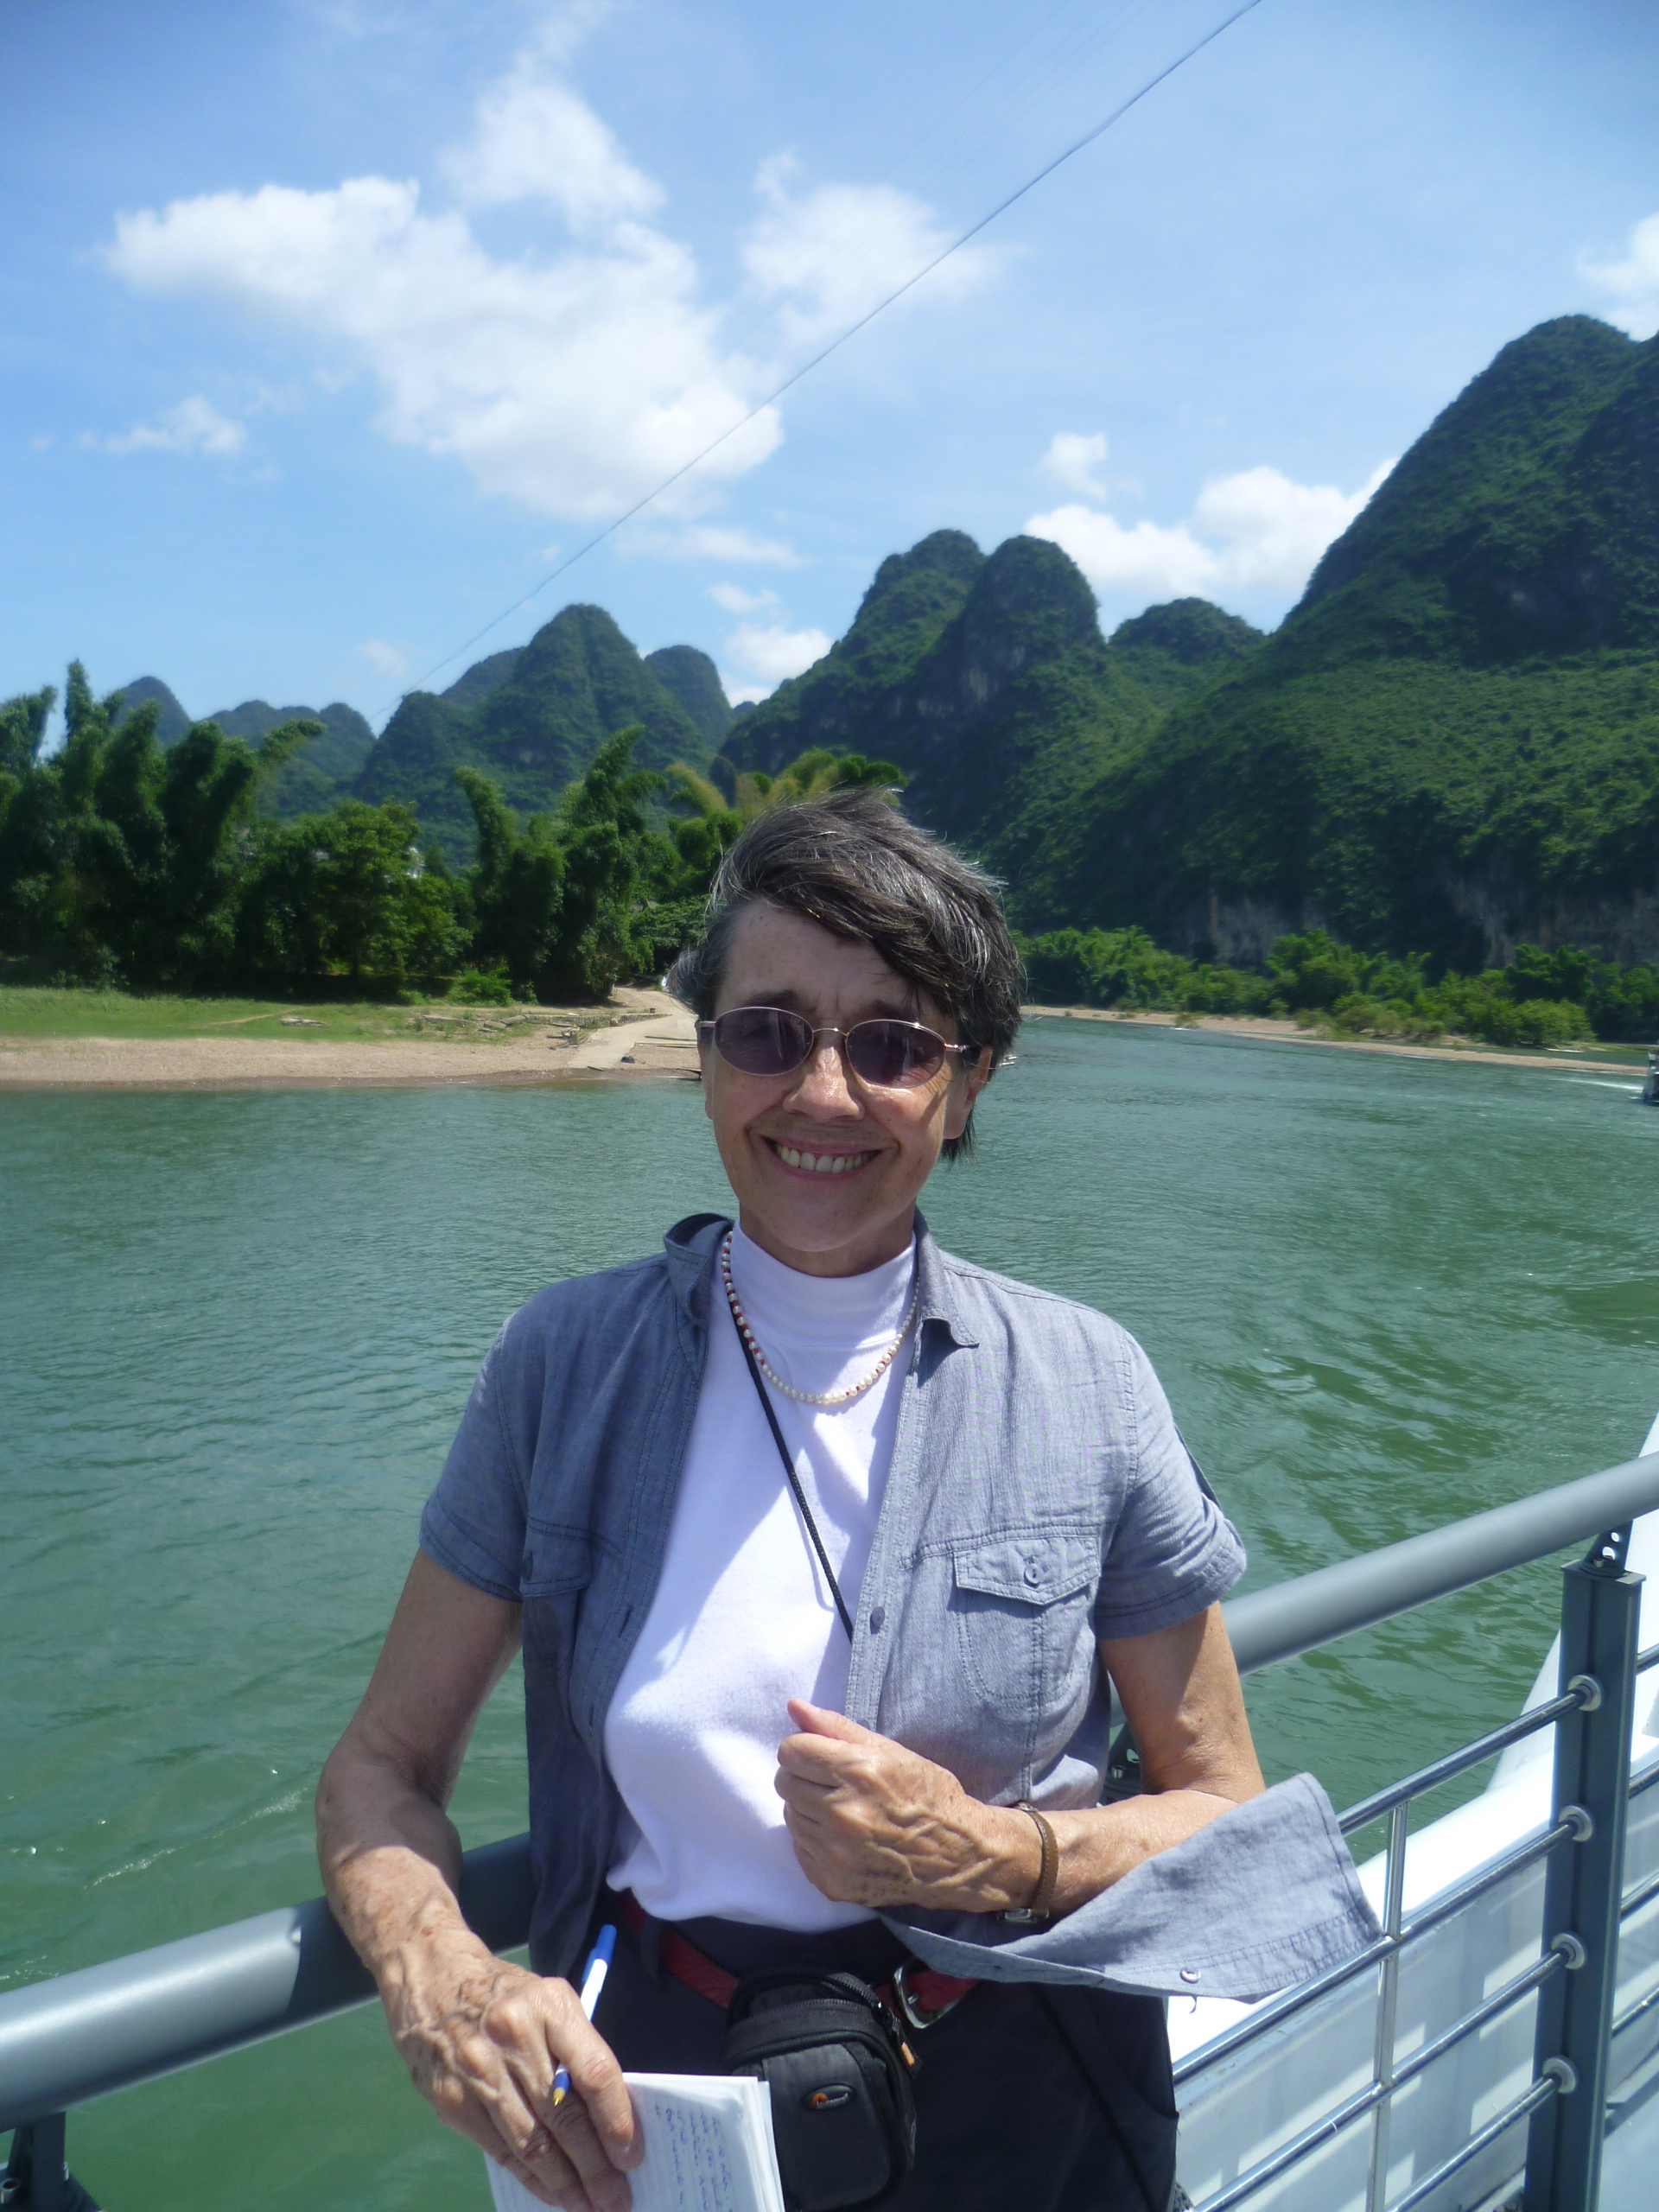 Rio Li - Guilin, sur de China